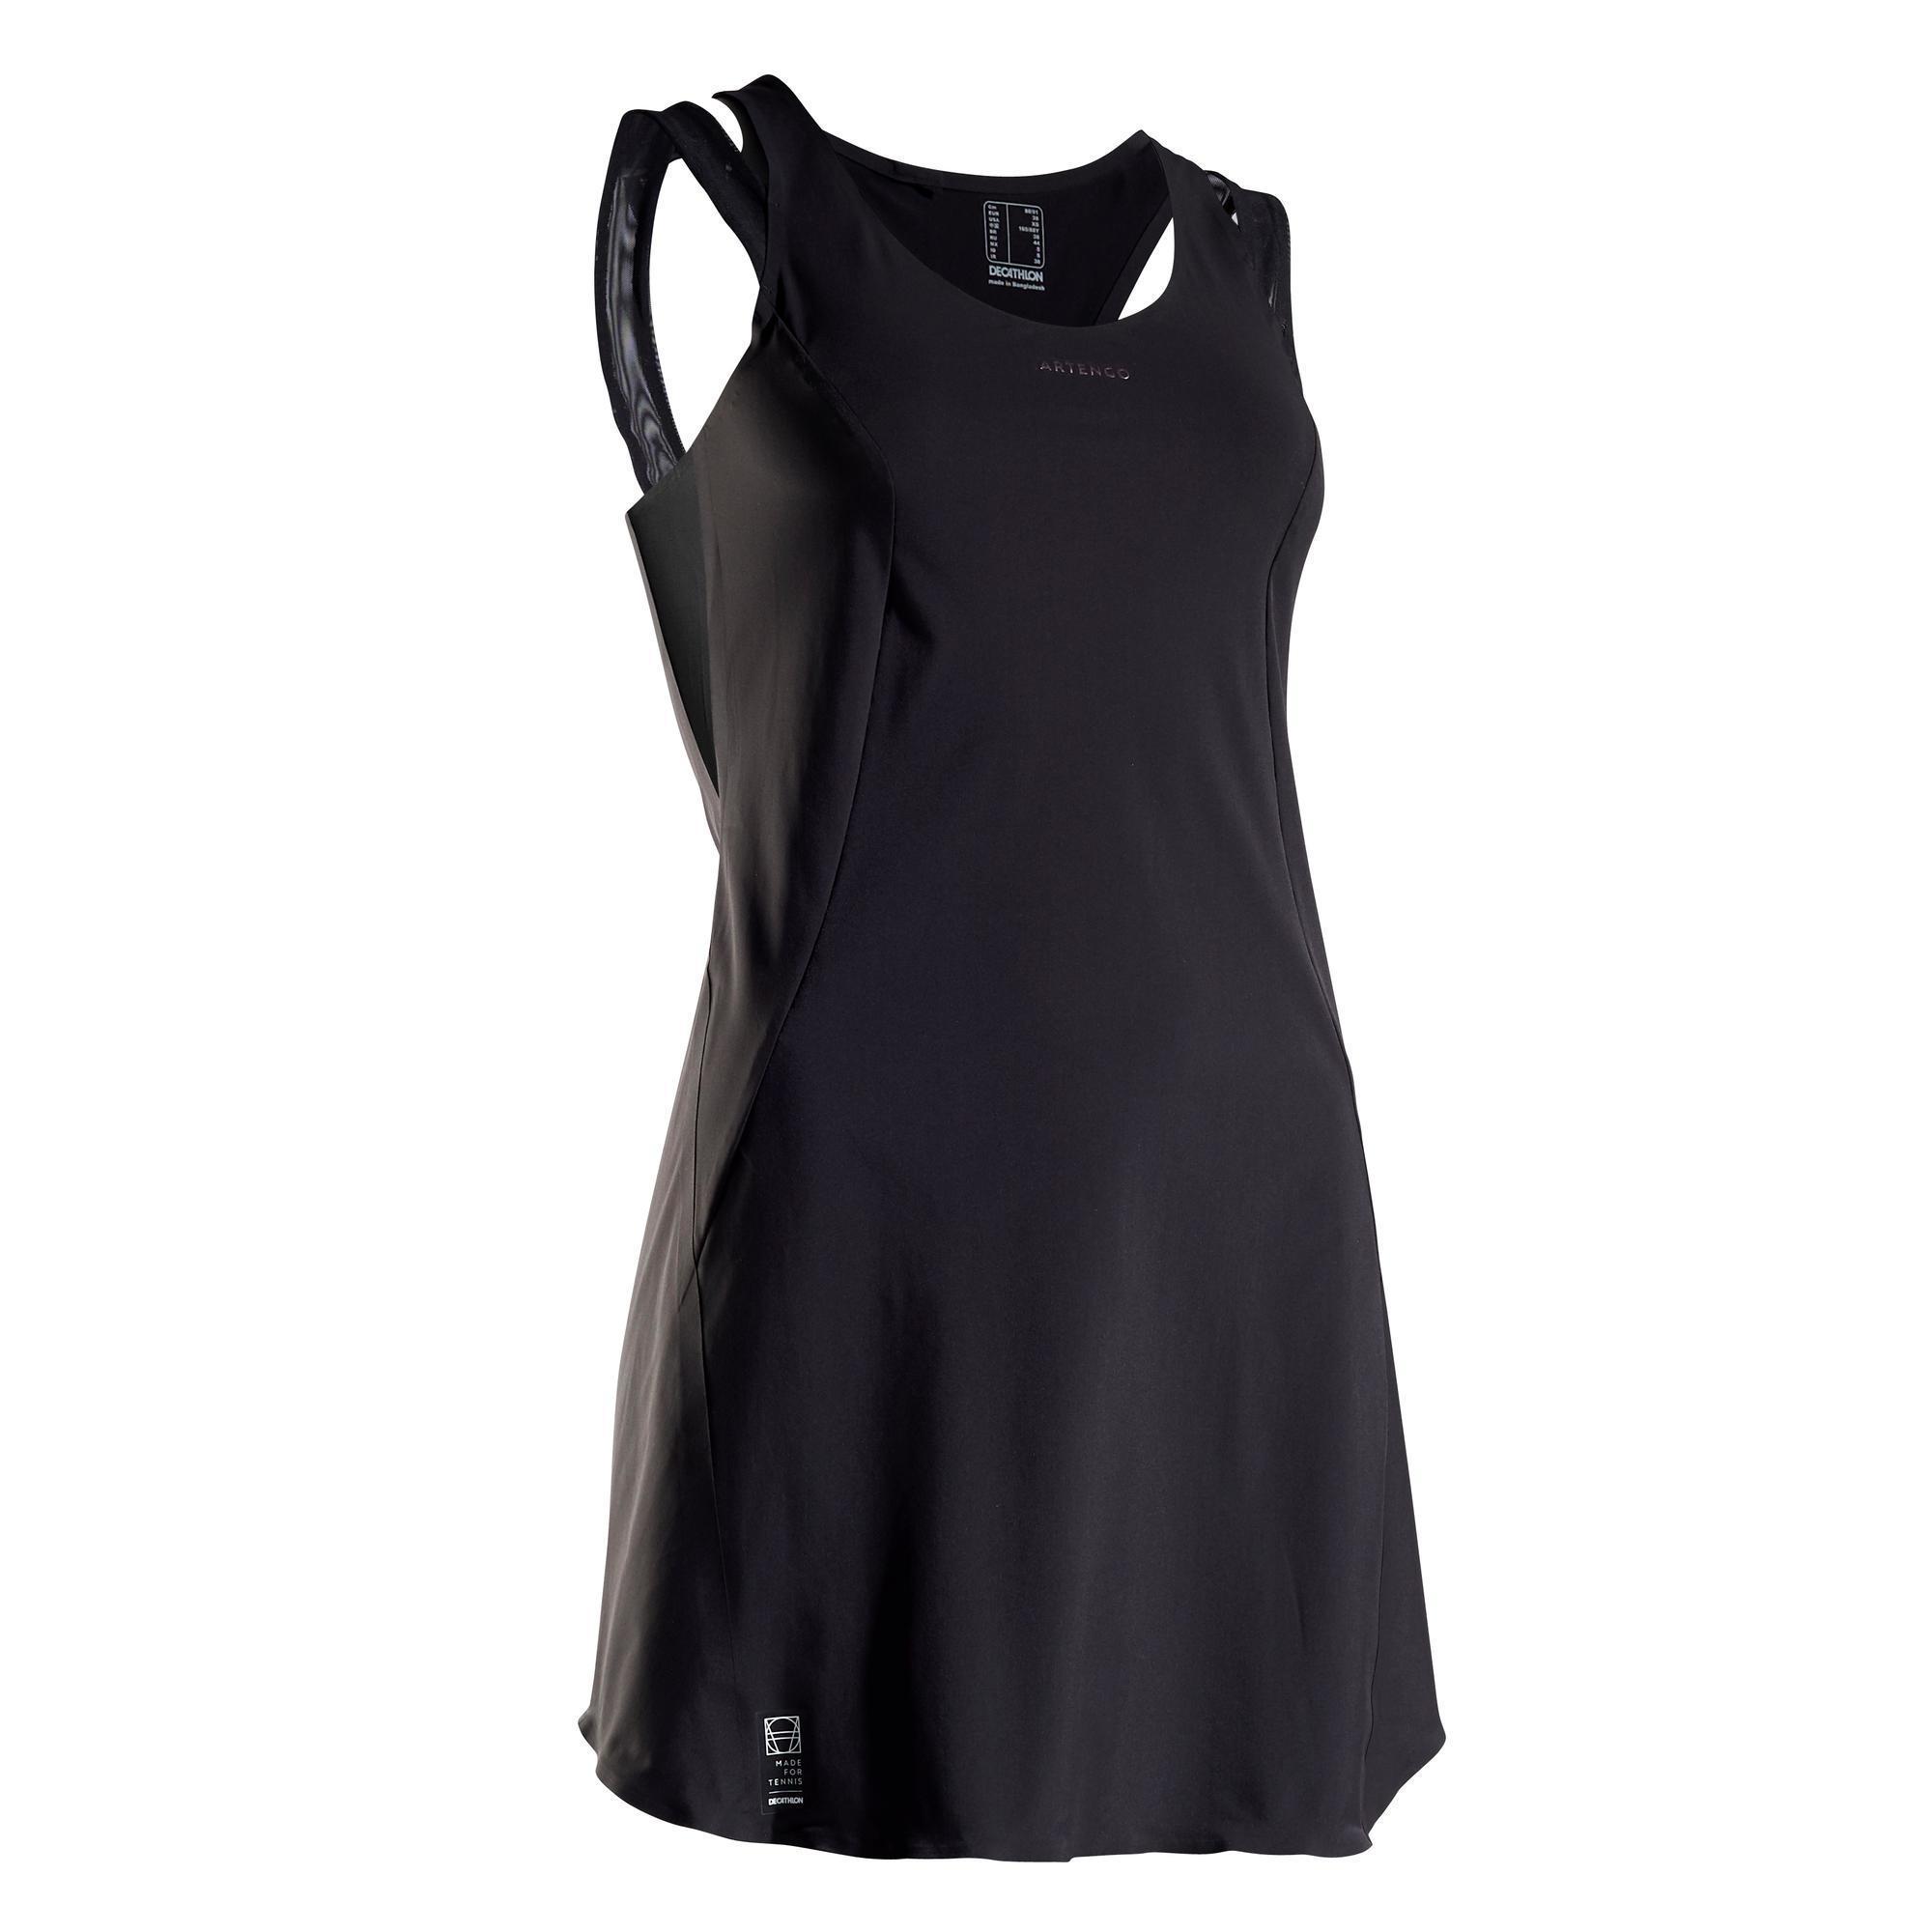 Tenniskleid DR Light 990 schwarz | Sportbekleidung > Sportröcke | Artengo